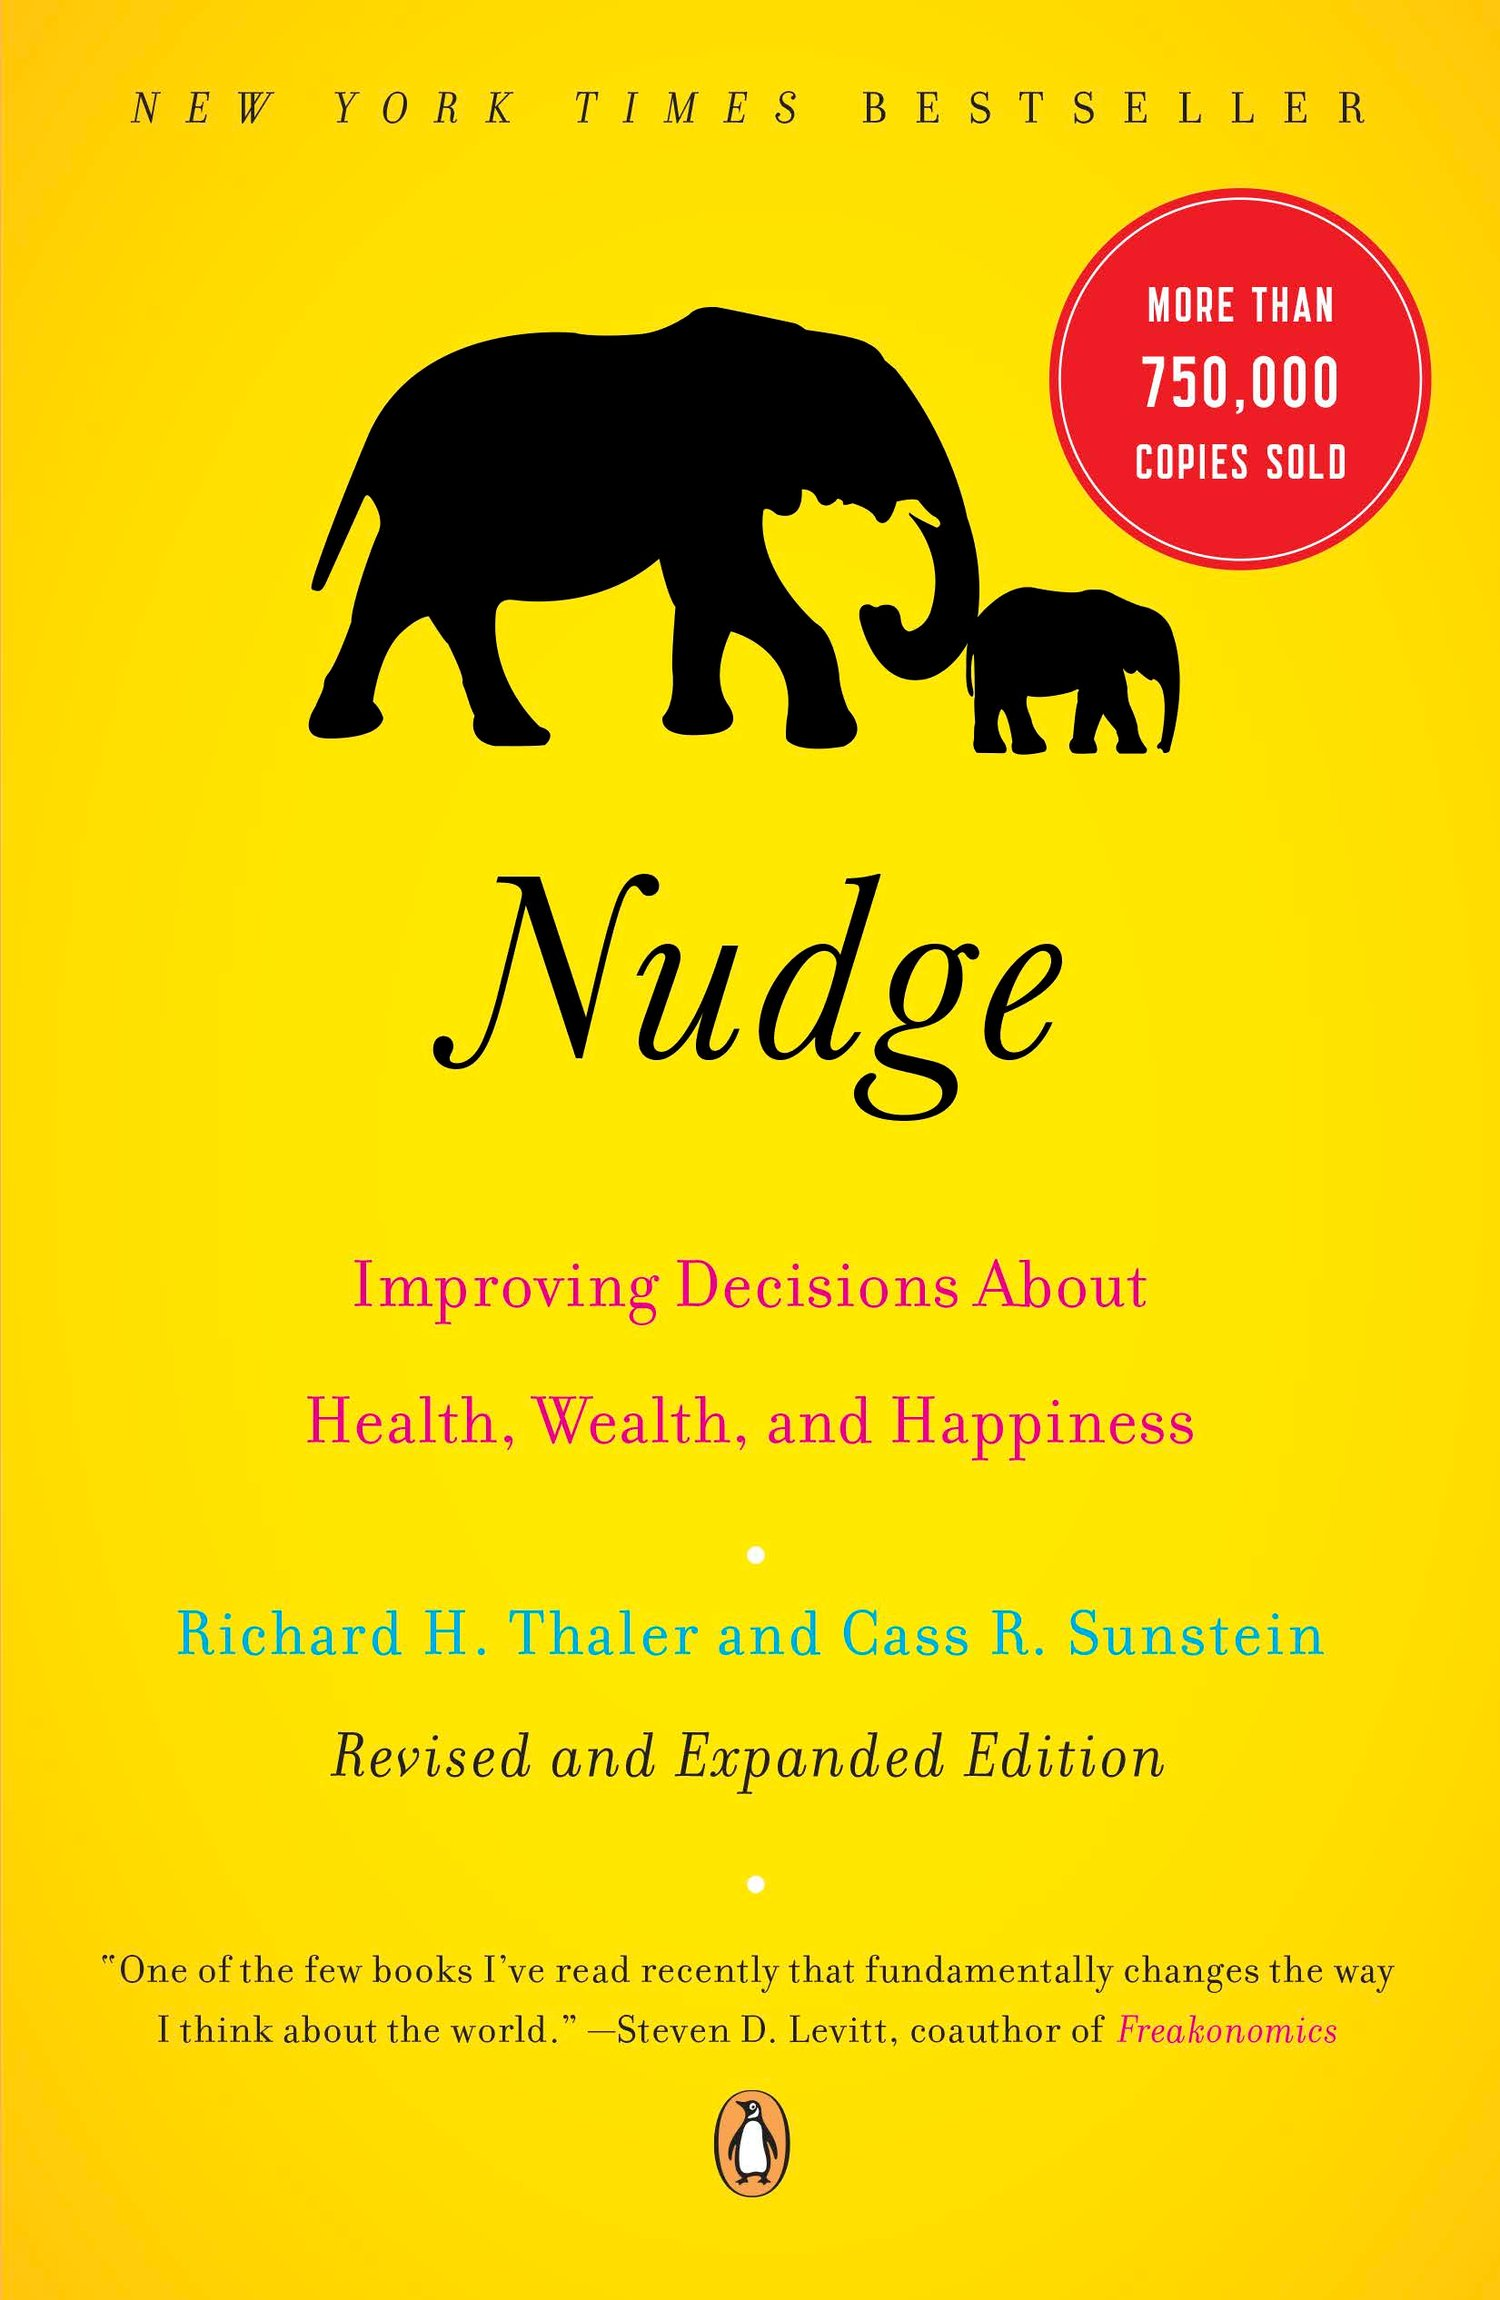 nudge neuromarketing book